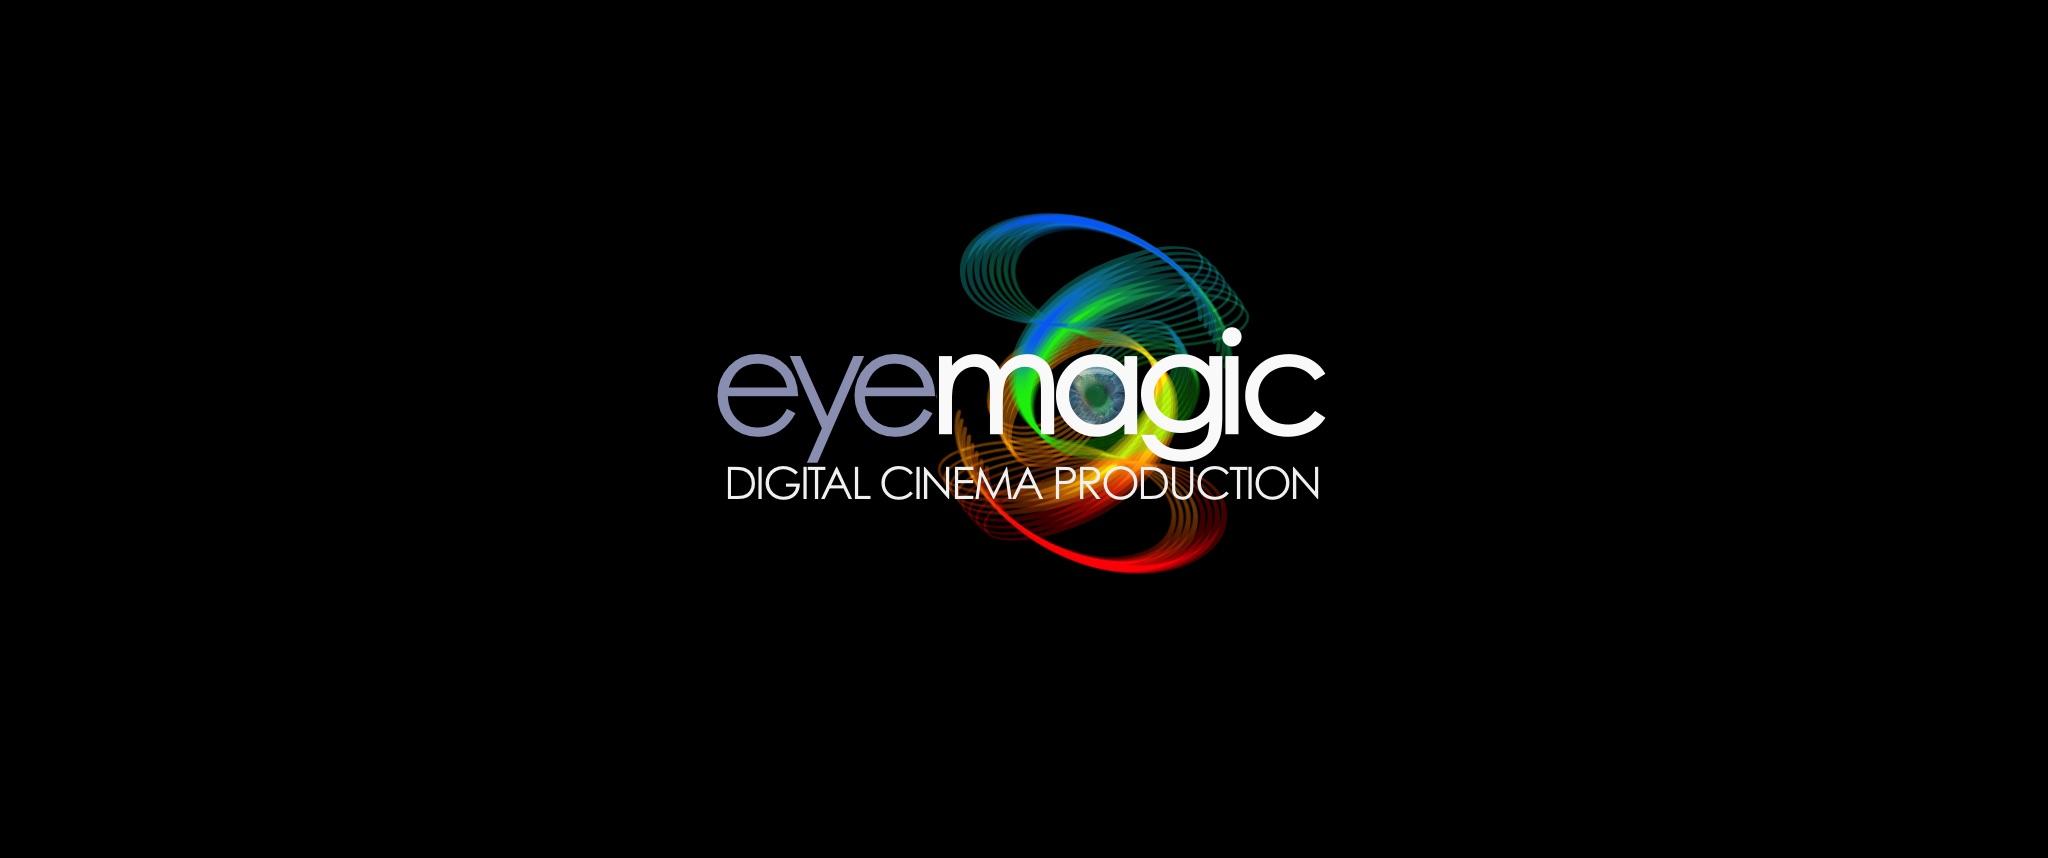 eyemagic_LOGO